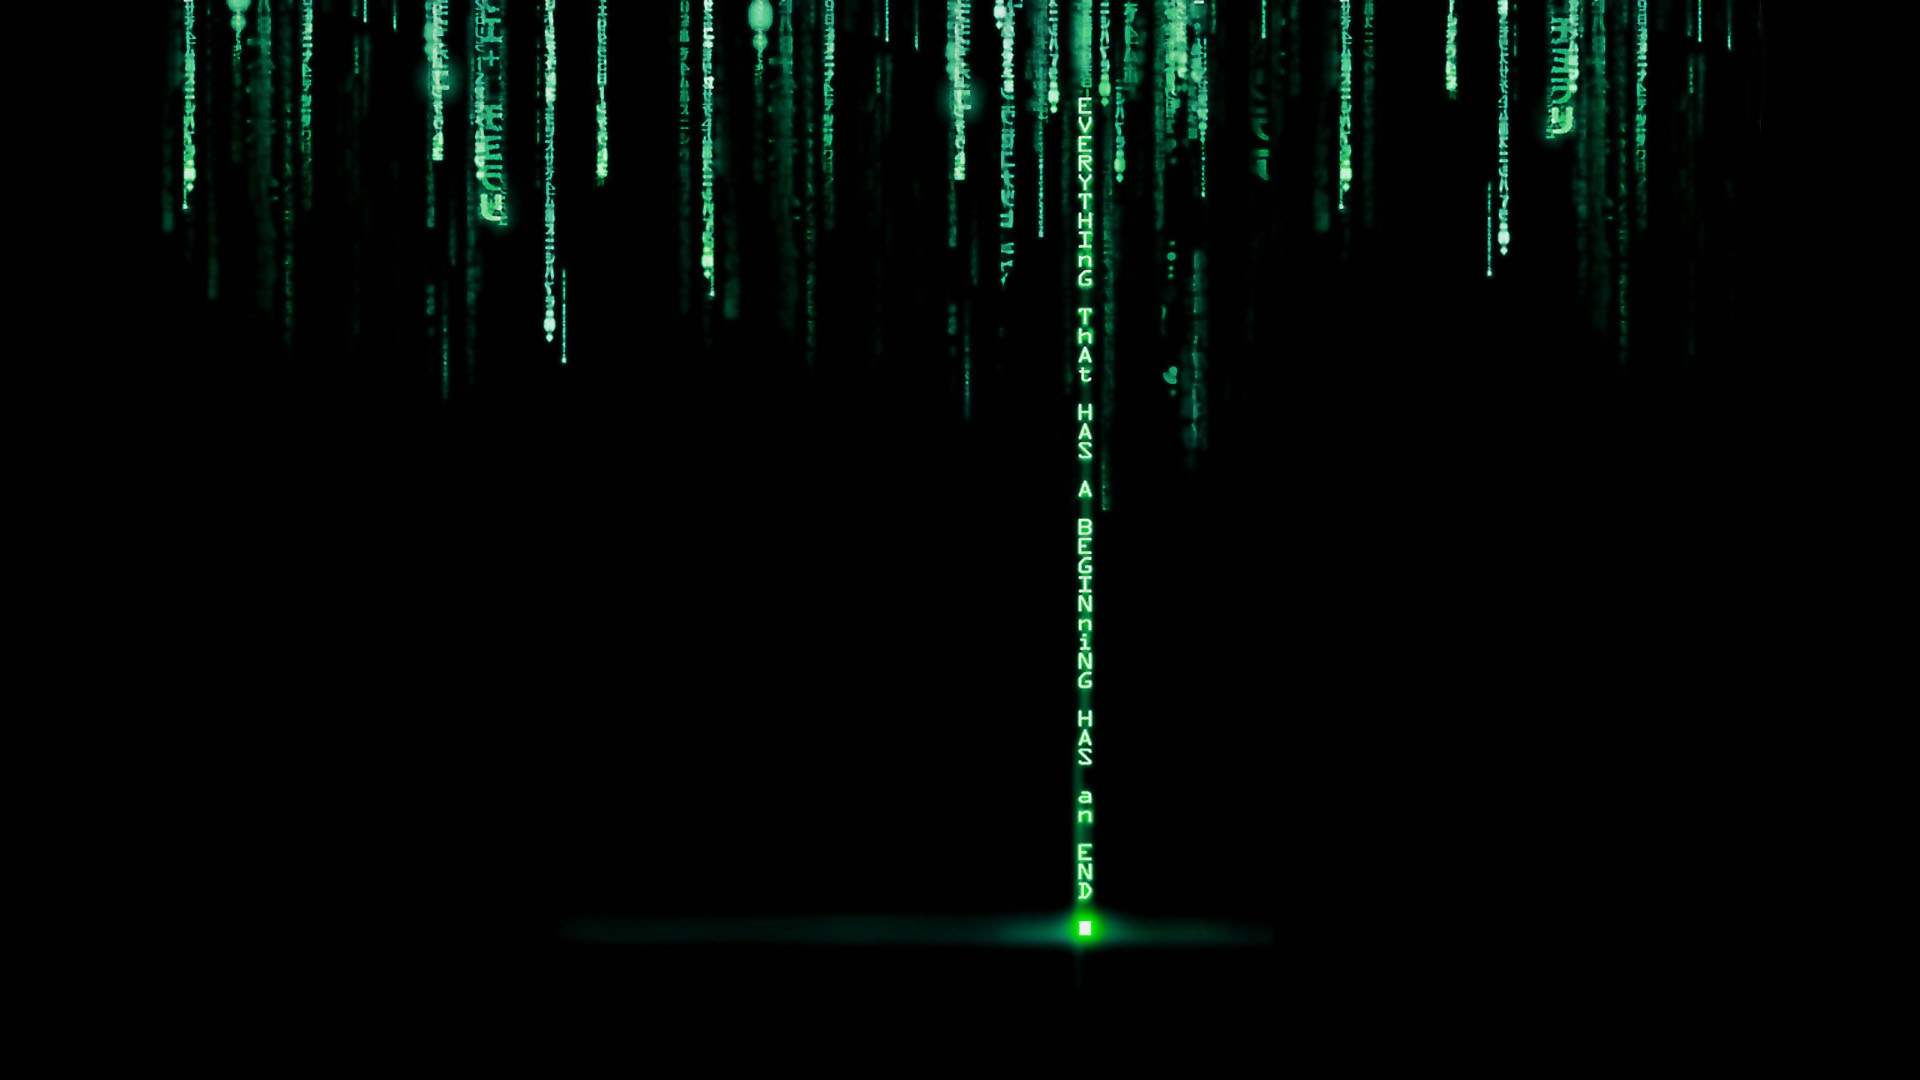 Intelligent Programing Code Wallpapers 1920x1080